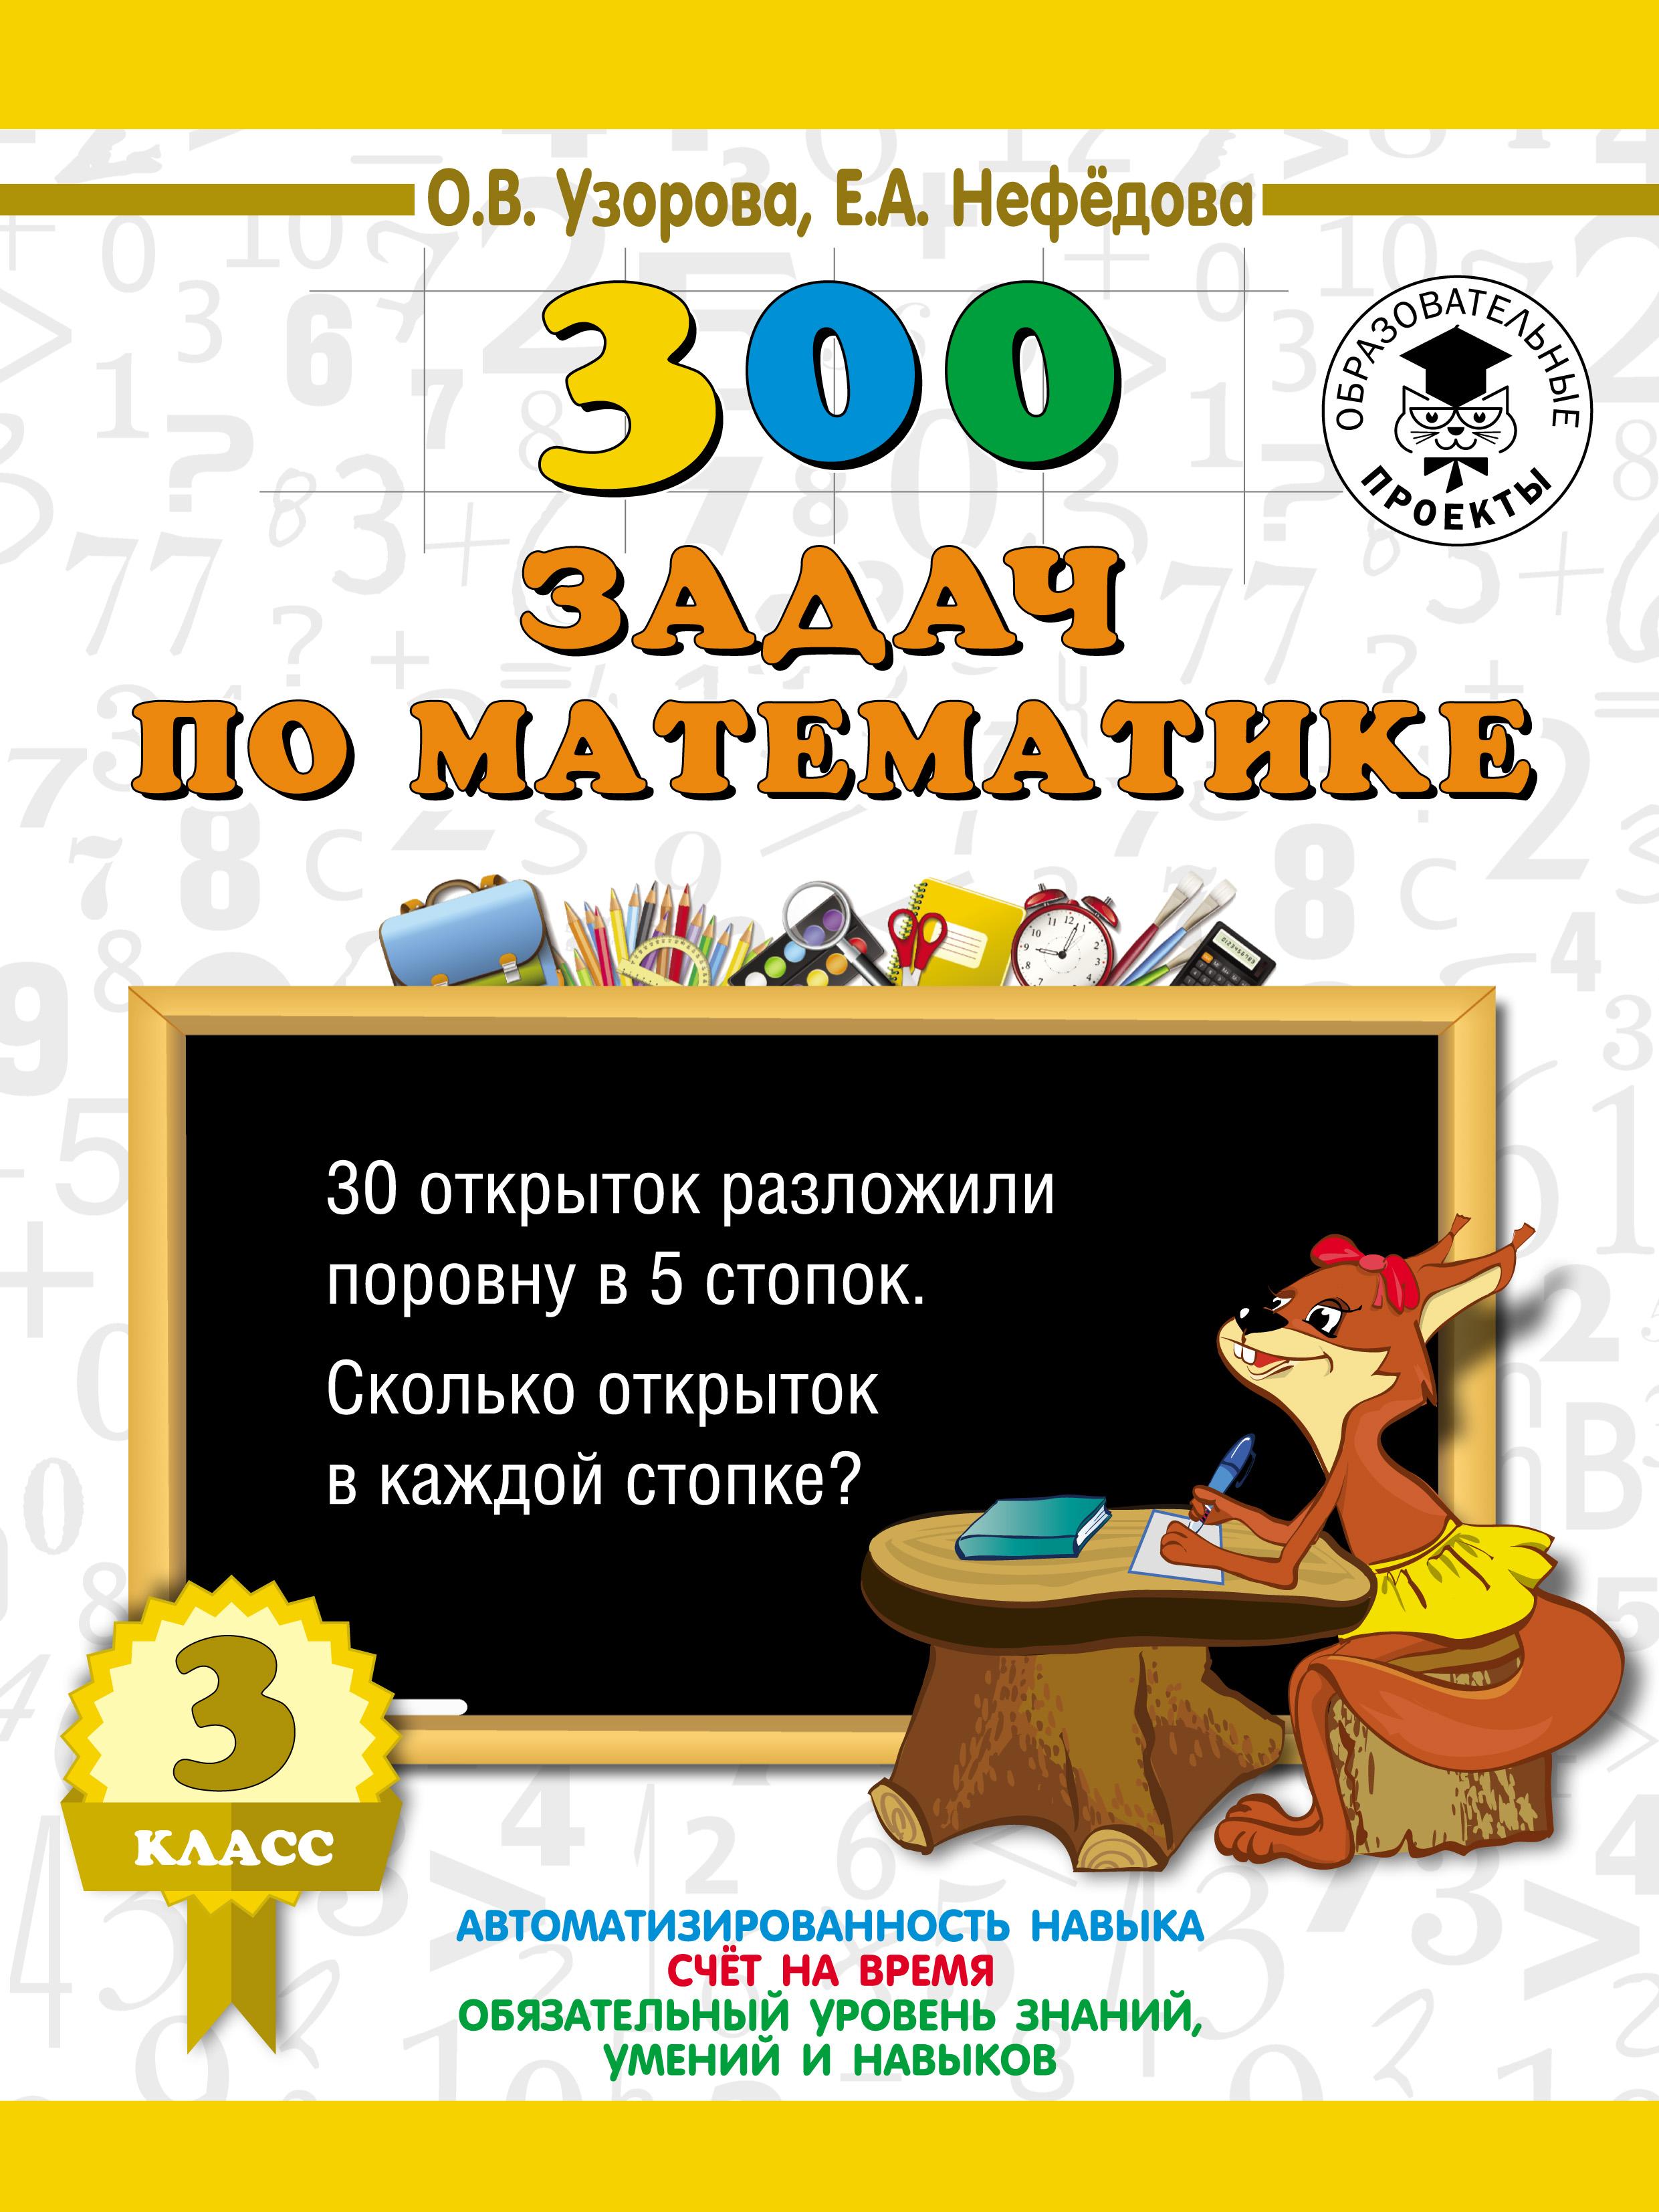 О. В. Узорова 300 задач по математике. 3 класс о в узорова 300 задач по математике 3 класс